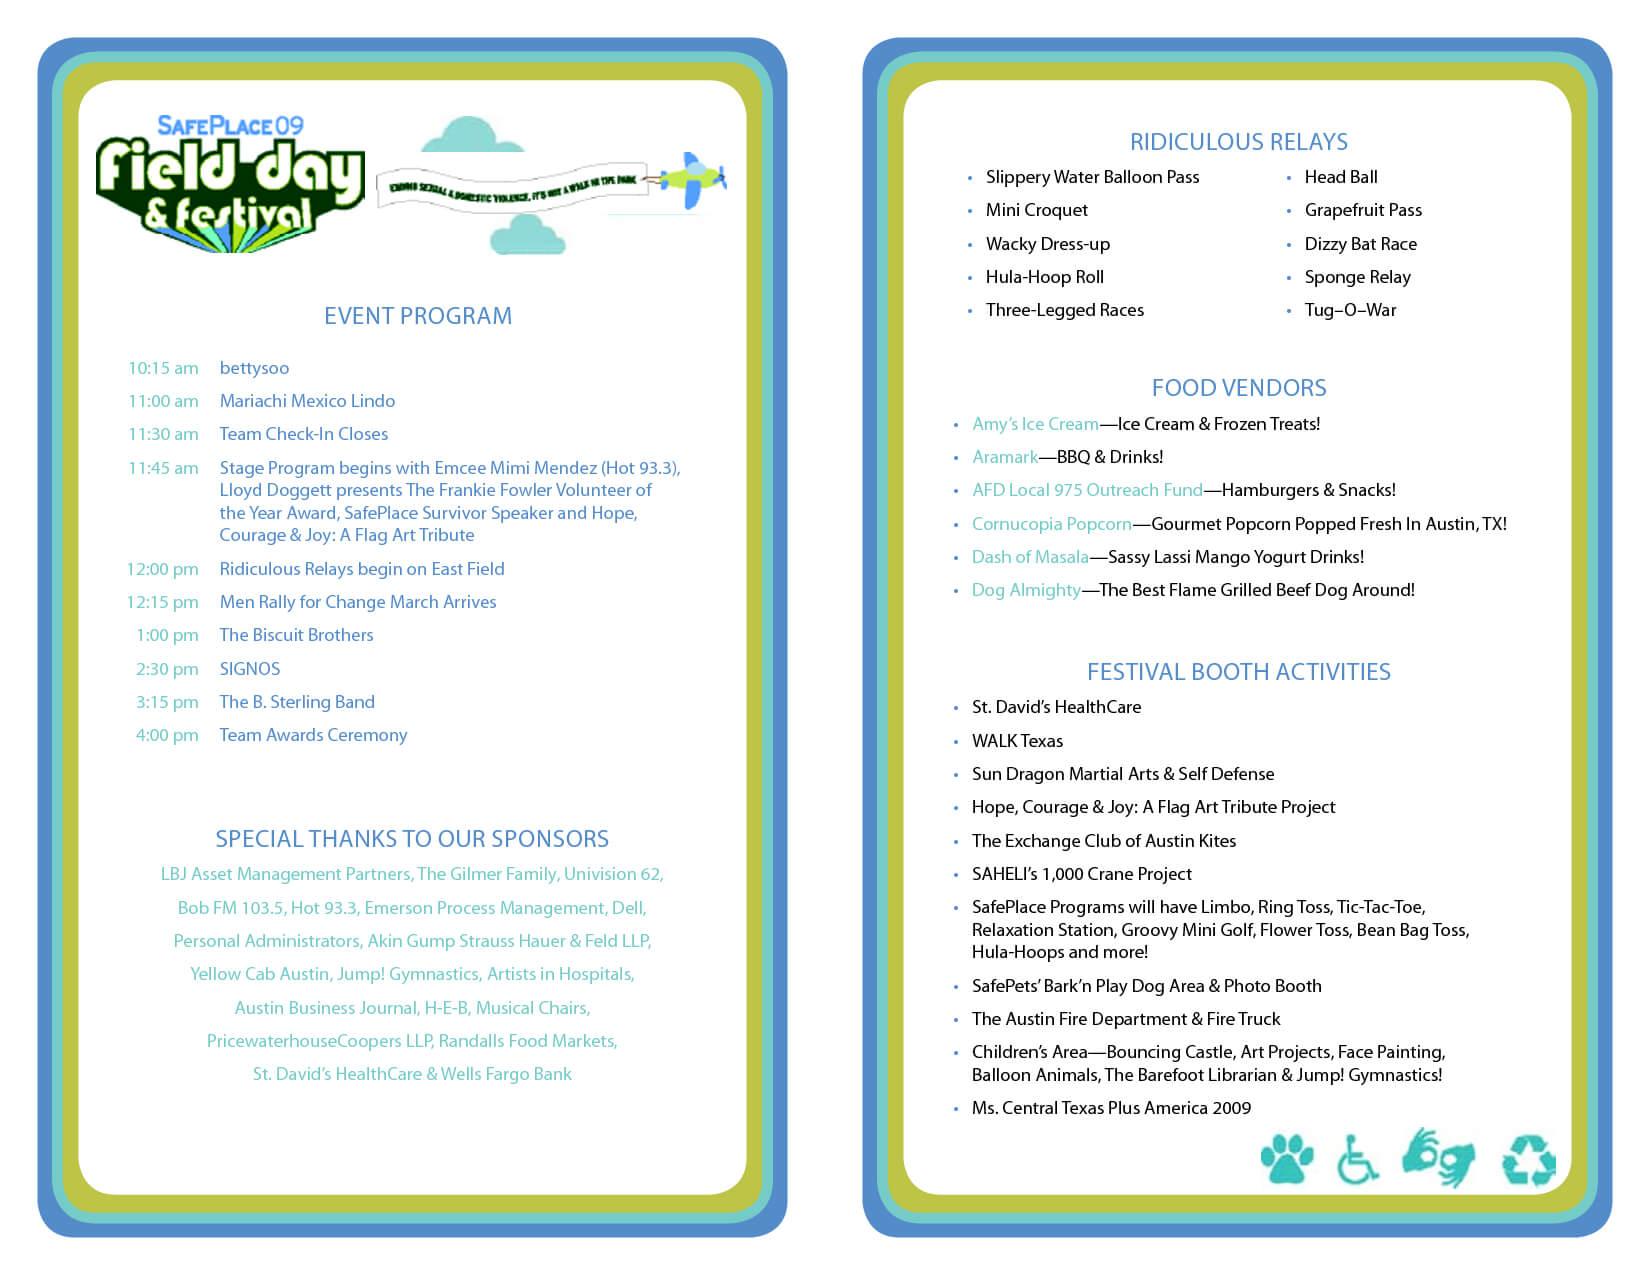 029 Sample Event Program Template 1926 Free Printable Within Free Event Program Templates Word